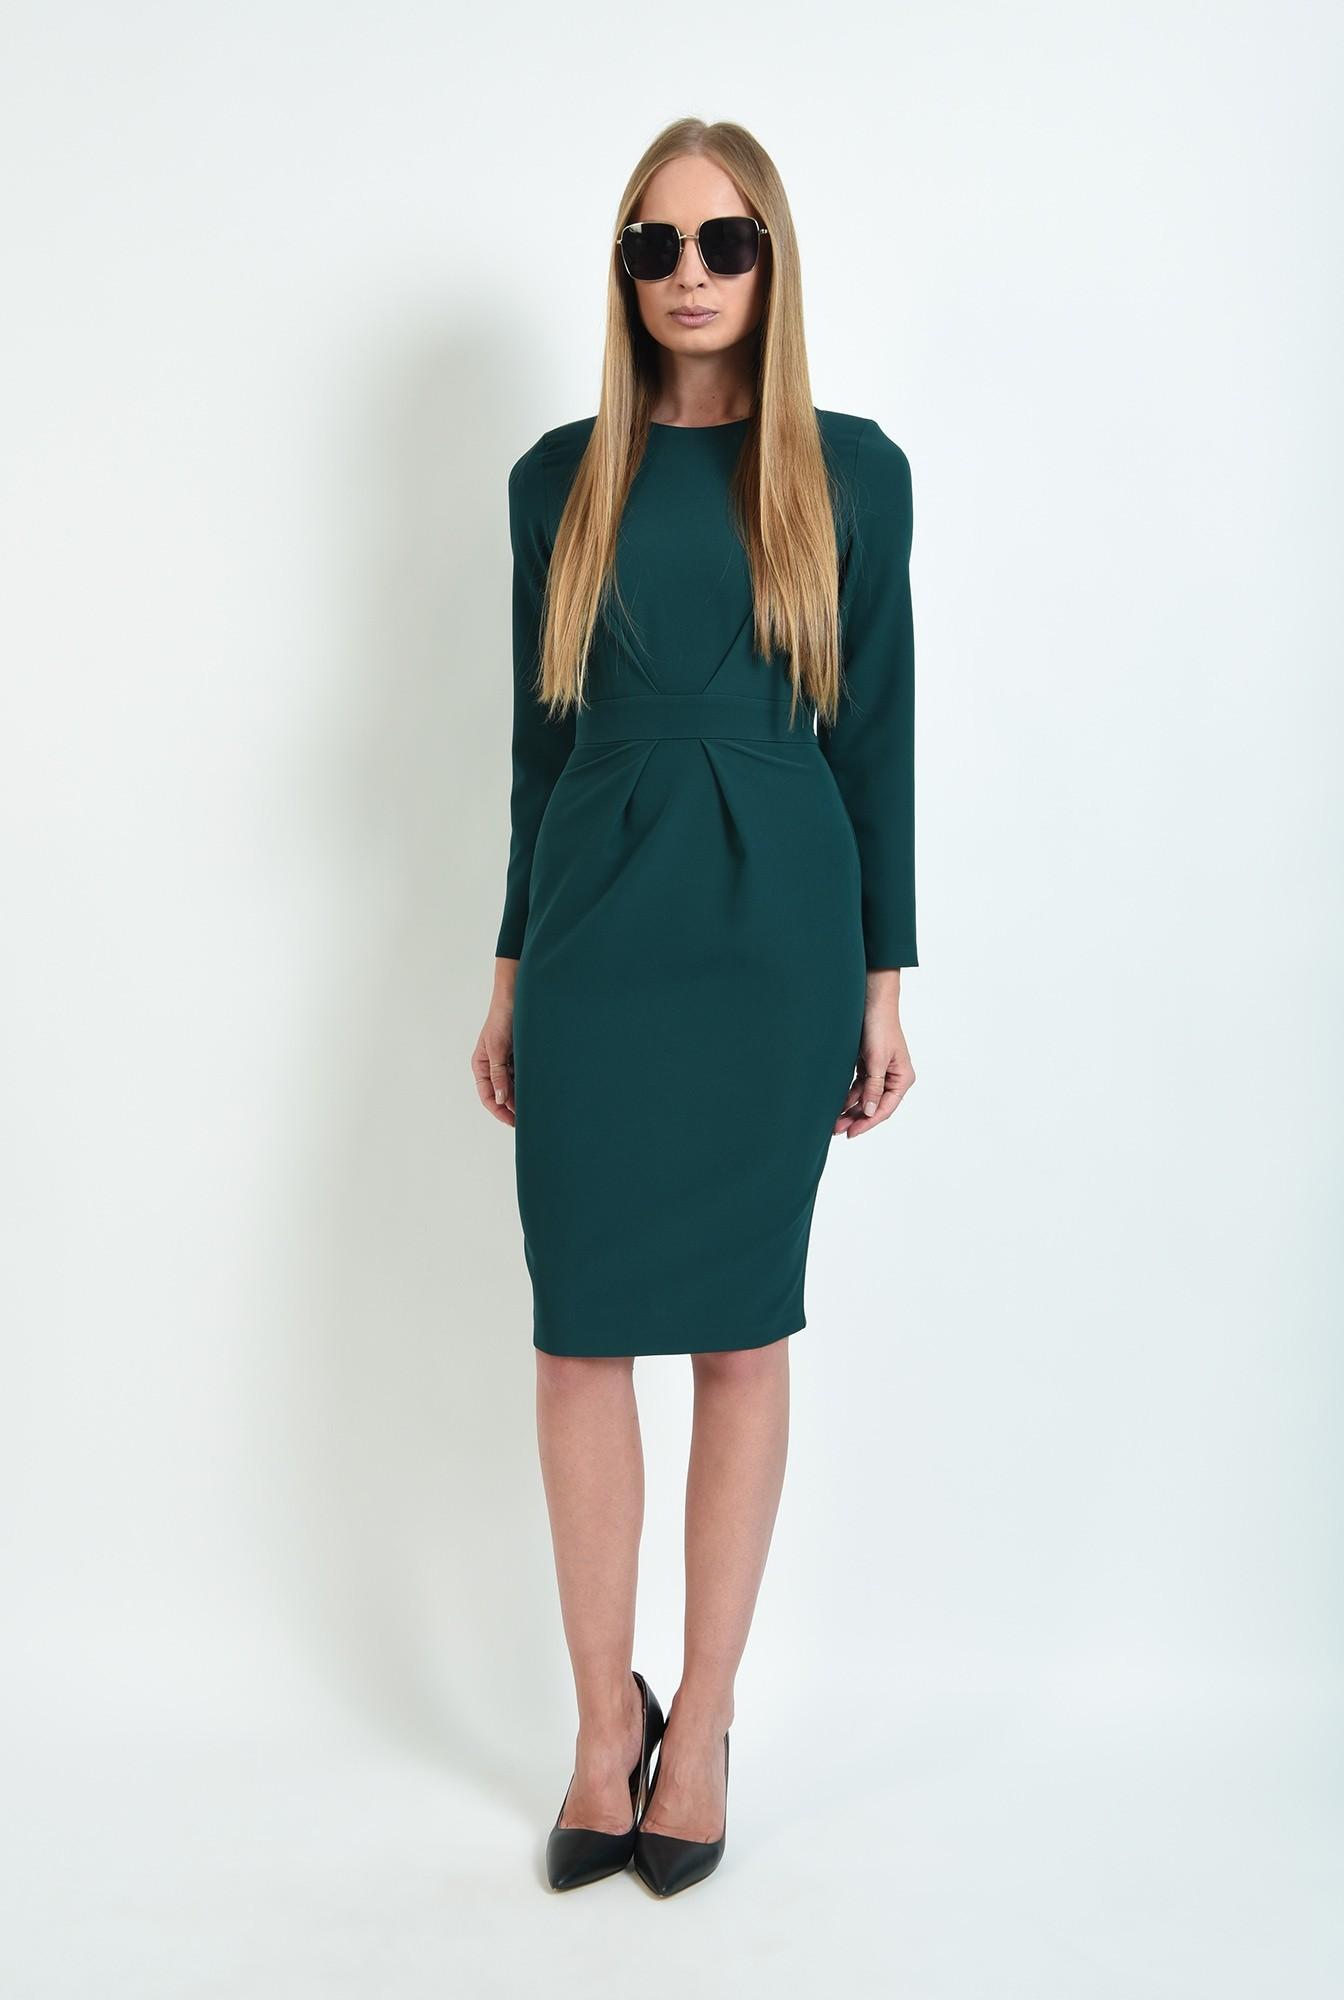 0 - rochie verde, office, cu pliuri, Poema